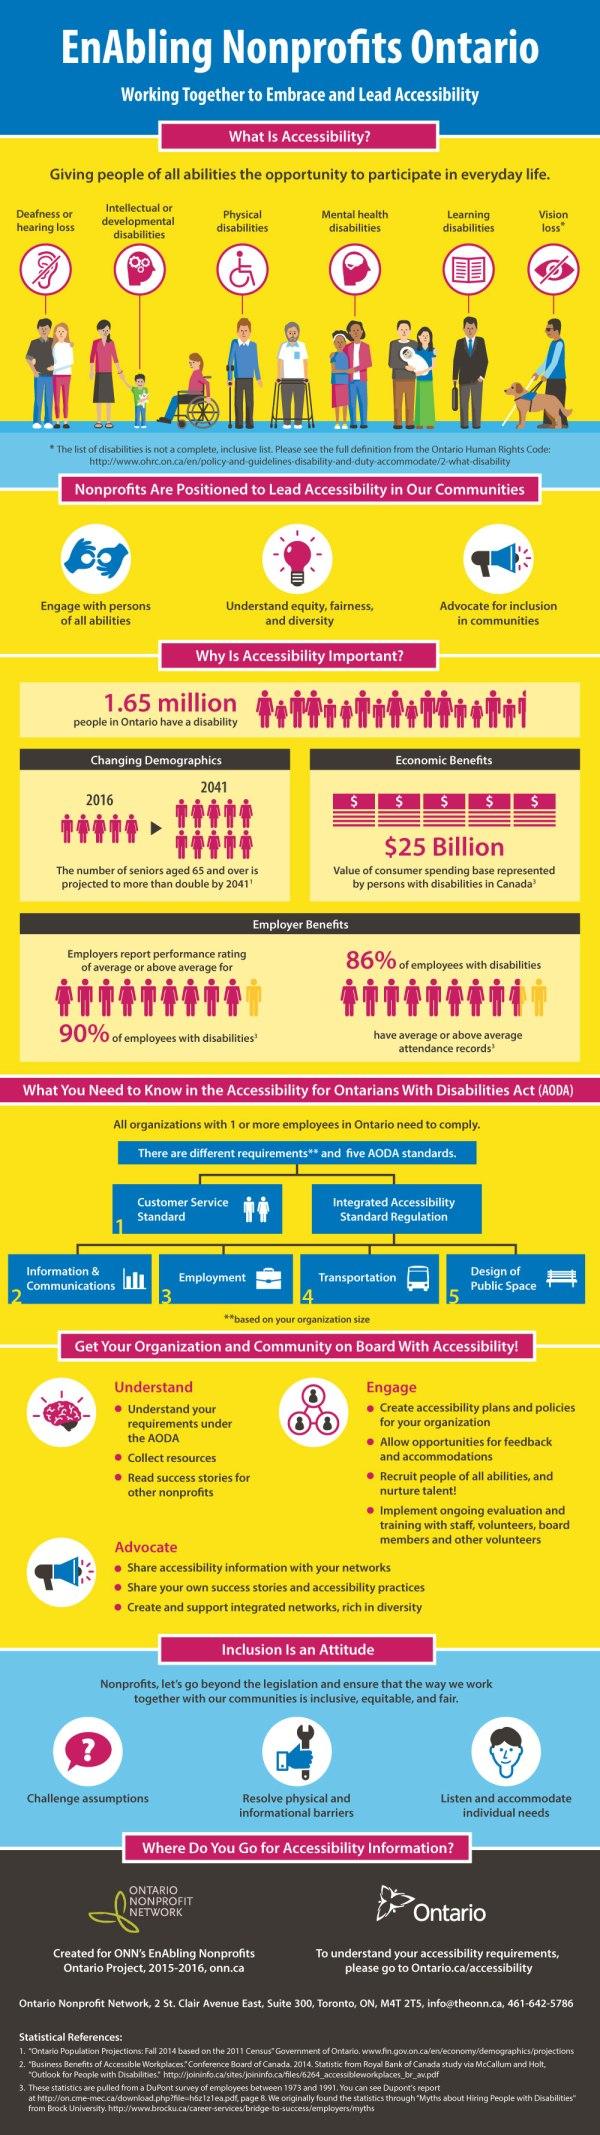 'Enabling Nonprofits Ontario' infographic by KAP Design and Ontario Nonprofit Network.